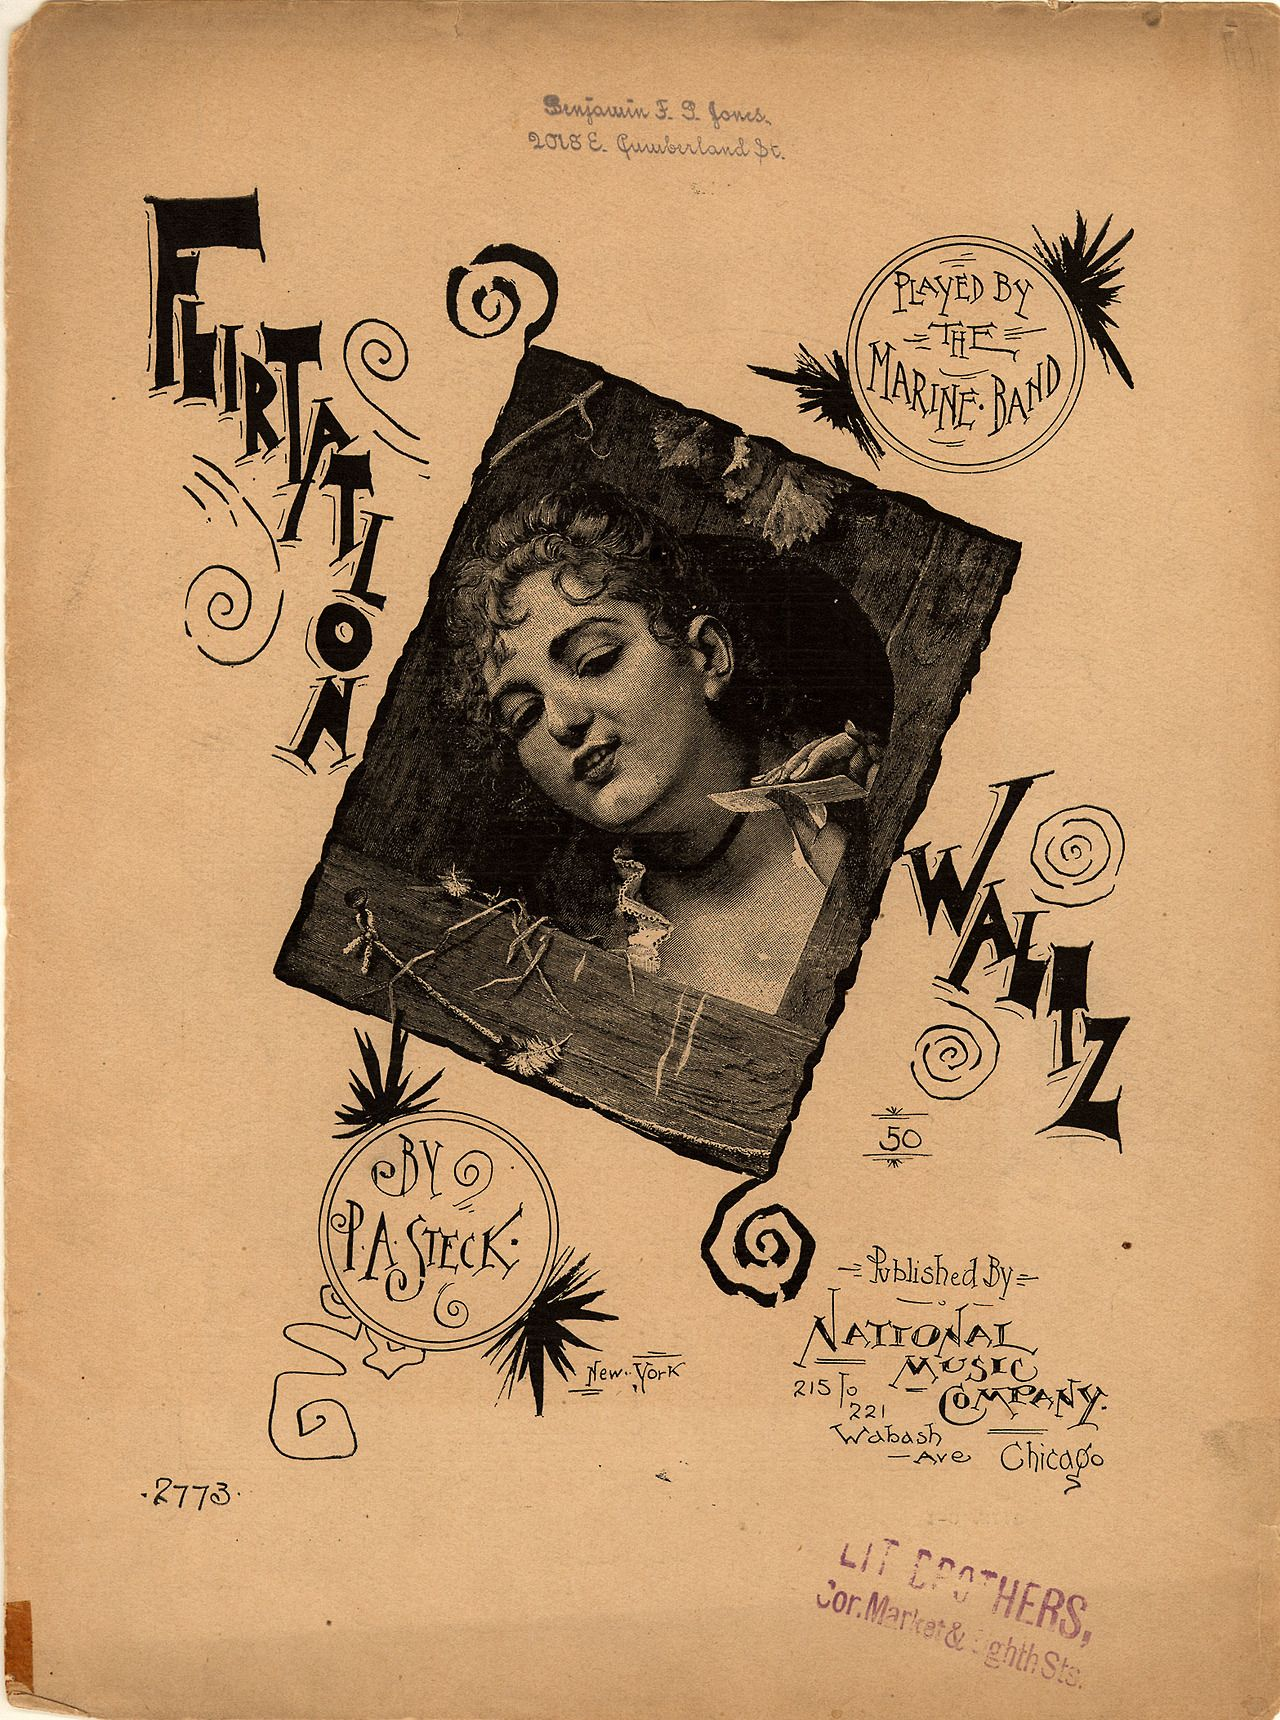 Flirtation Waltz (1890). Paul Albert Steck, New York